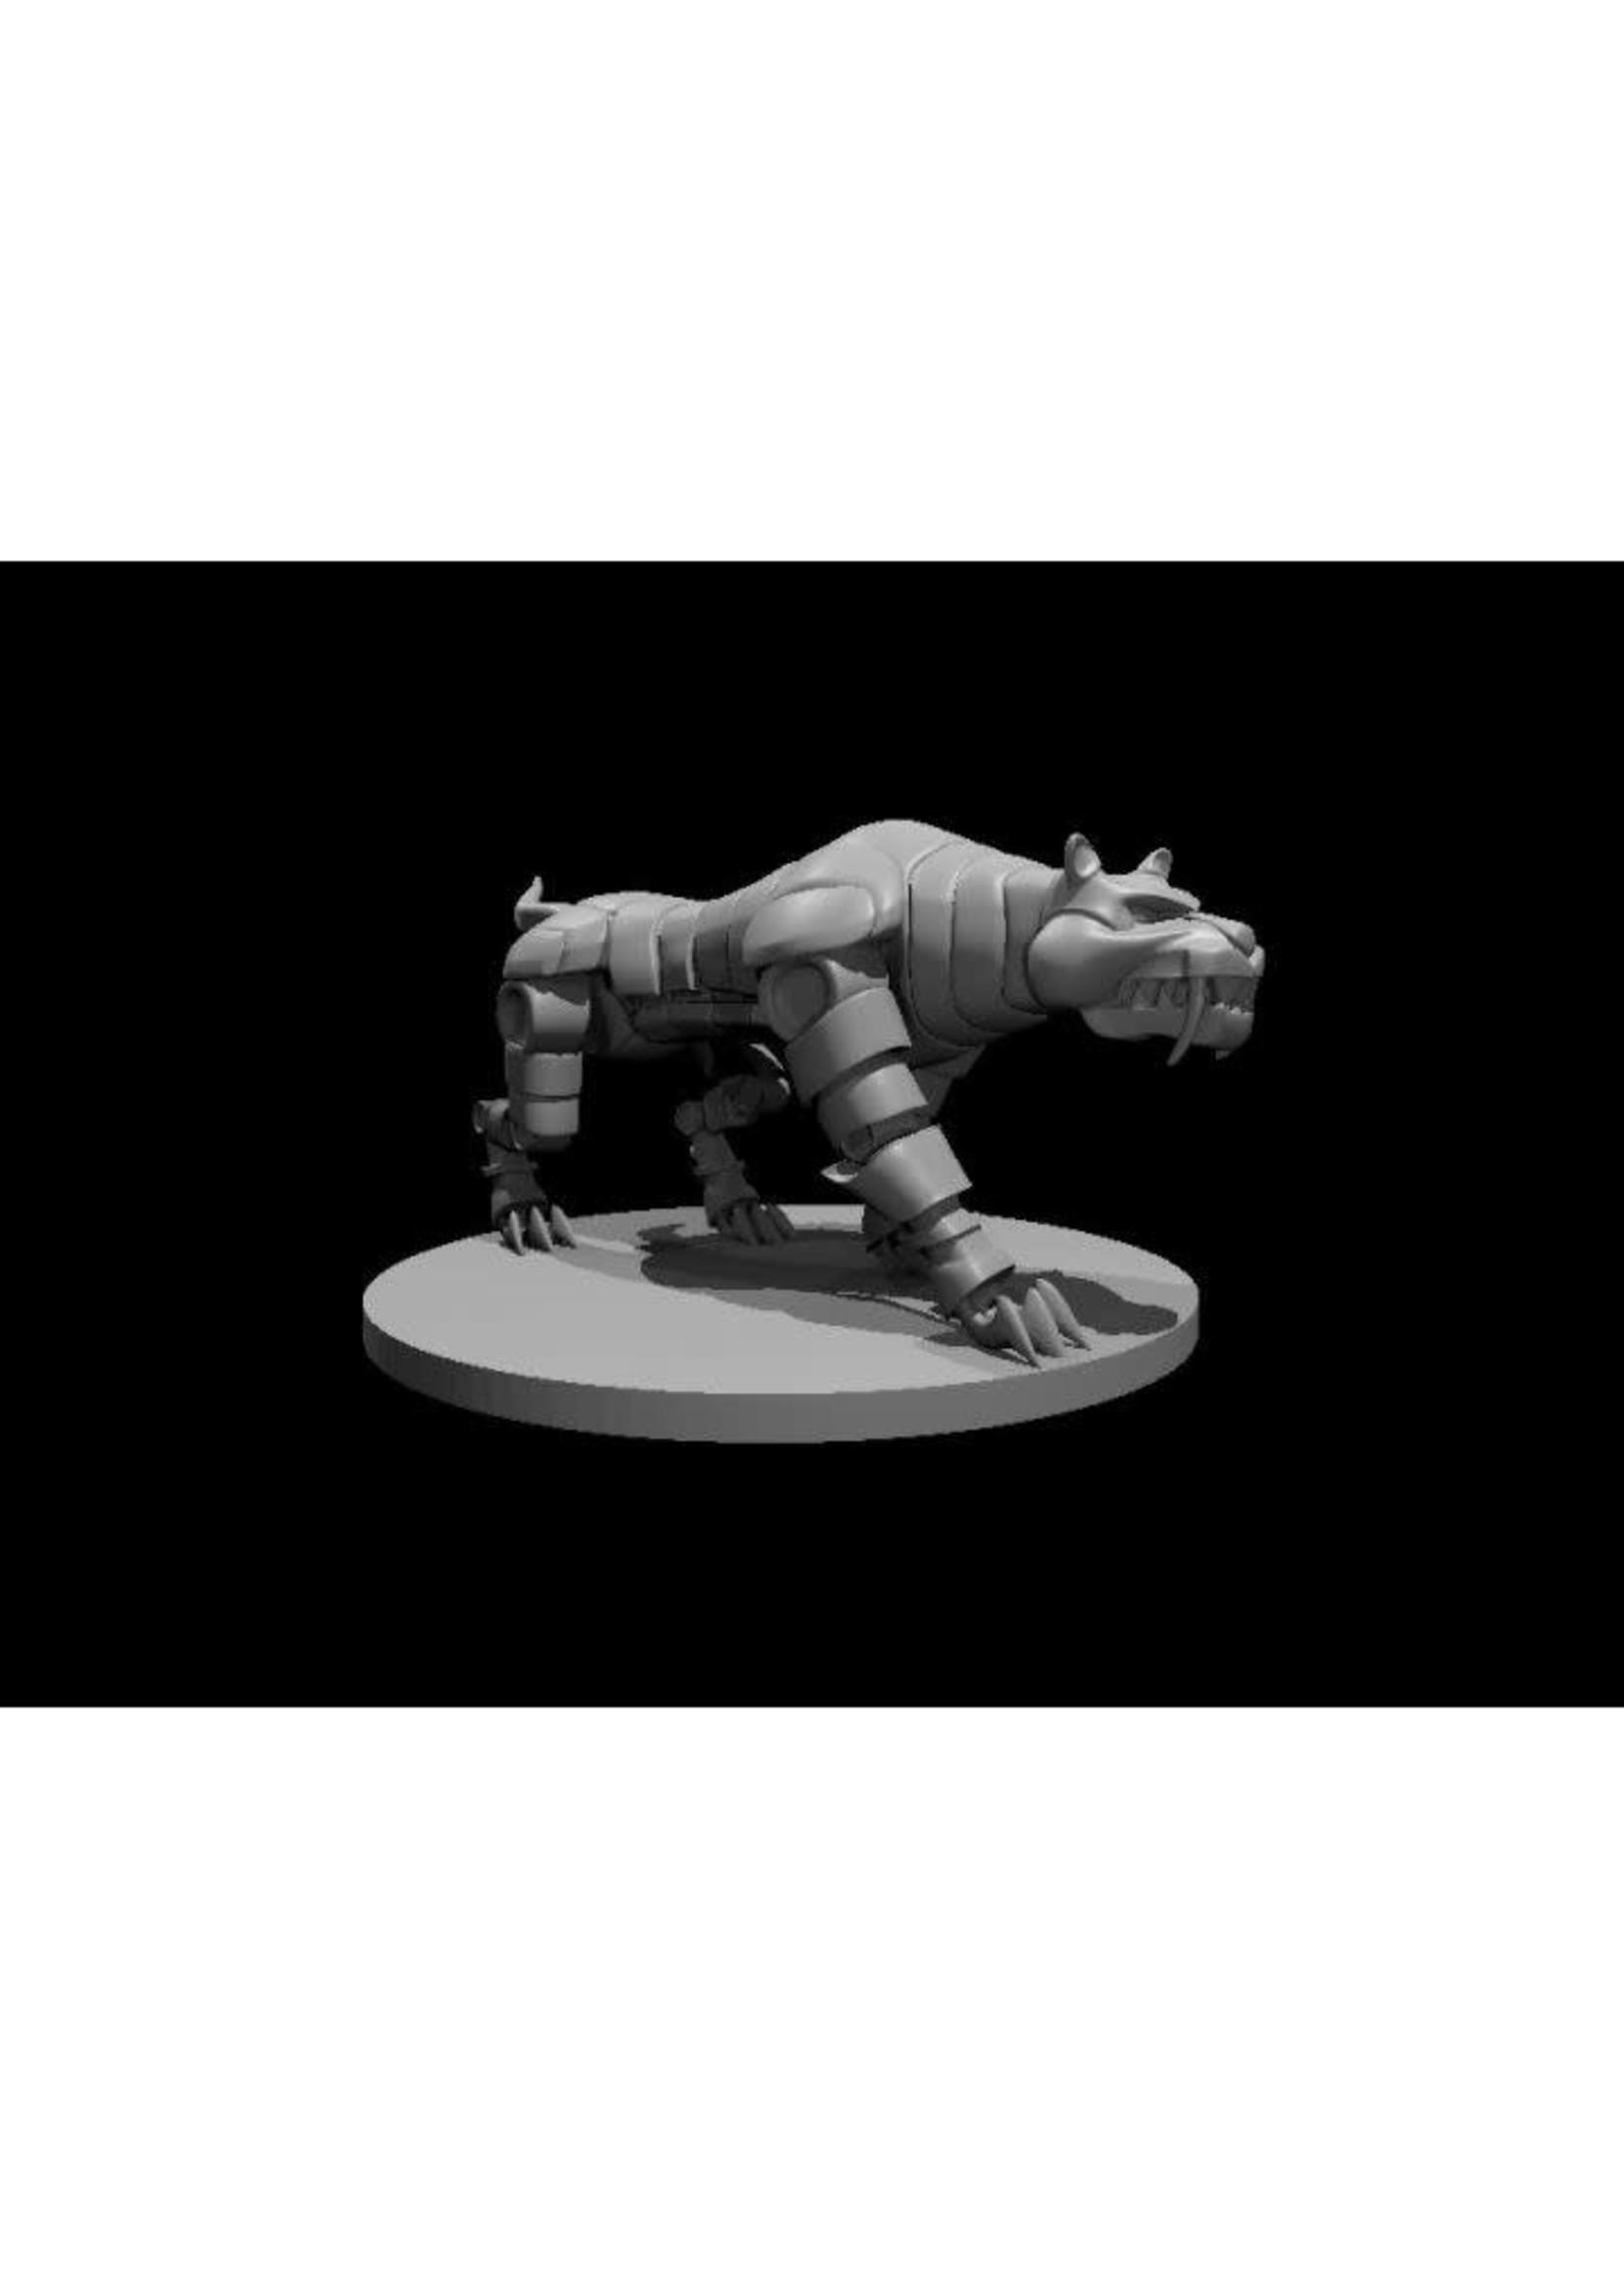 Clockwork Saber Tooth Tiger (Patreon Mz4250)